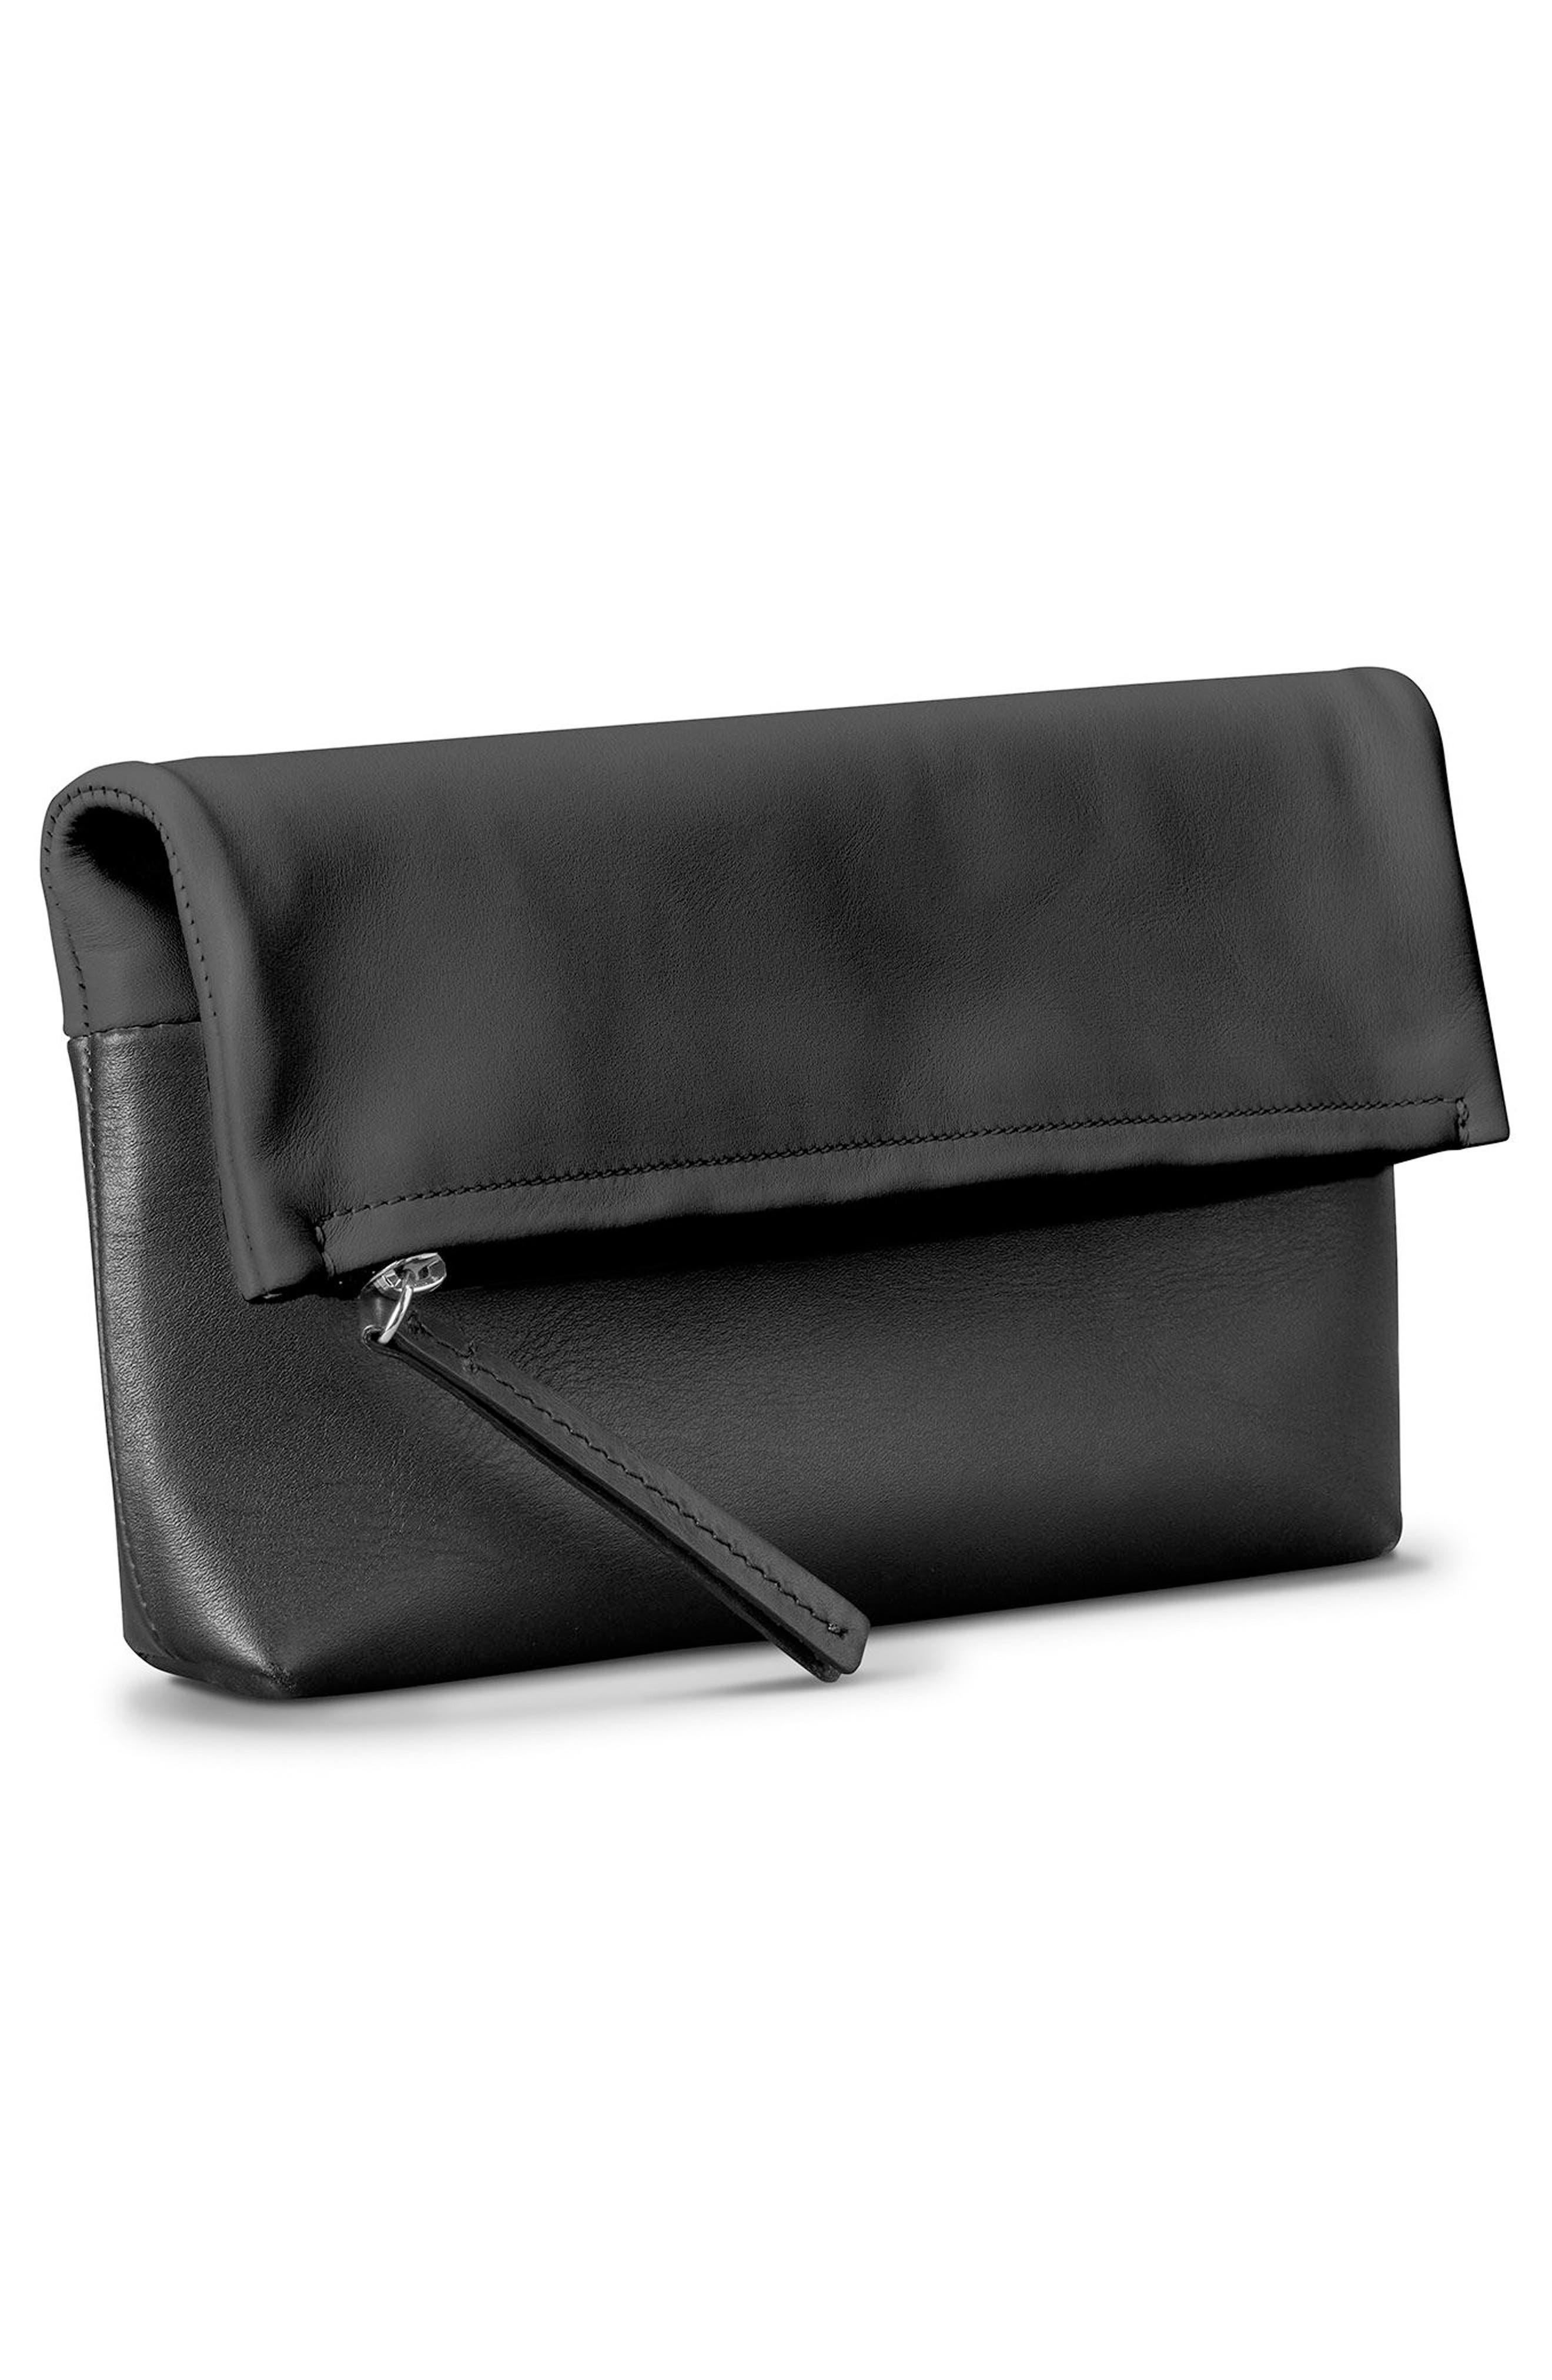 Birdy Leather Foldover Clutch,                             Alternate thumbnail 4, color,                             Black